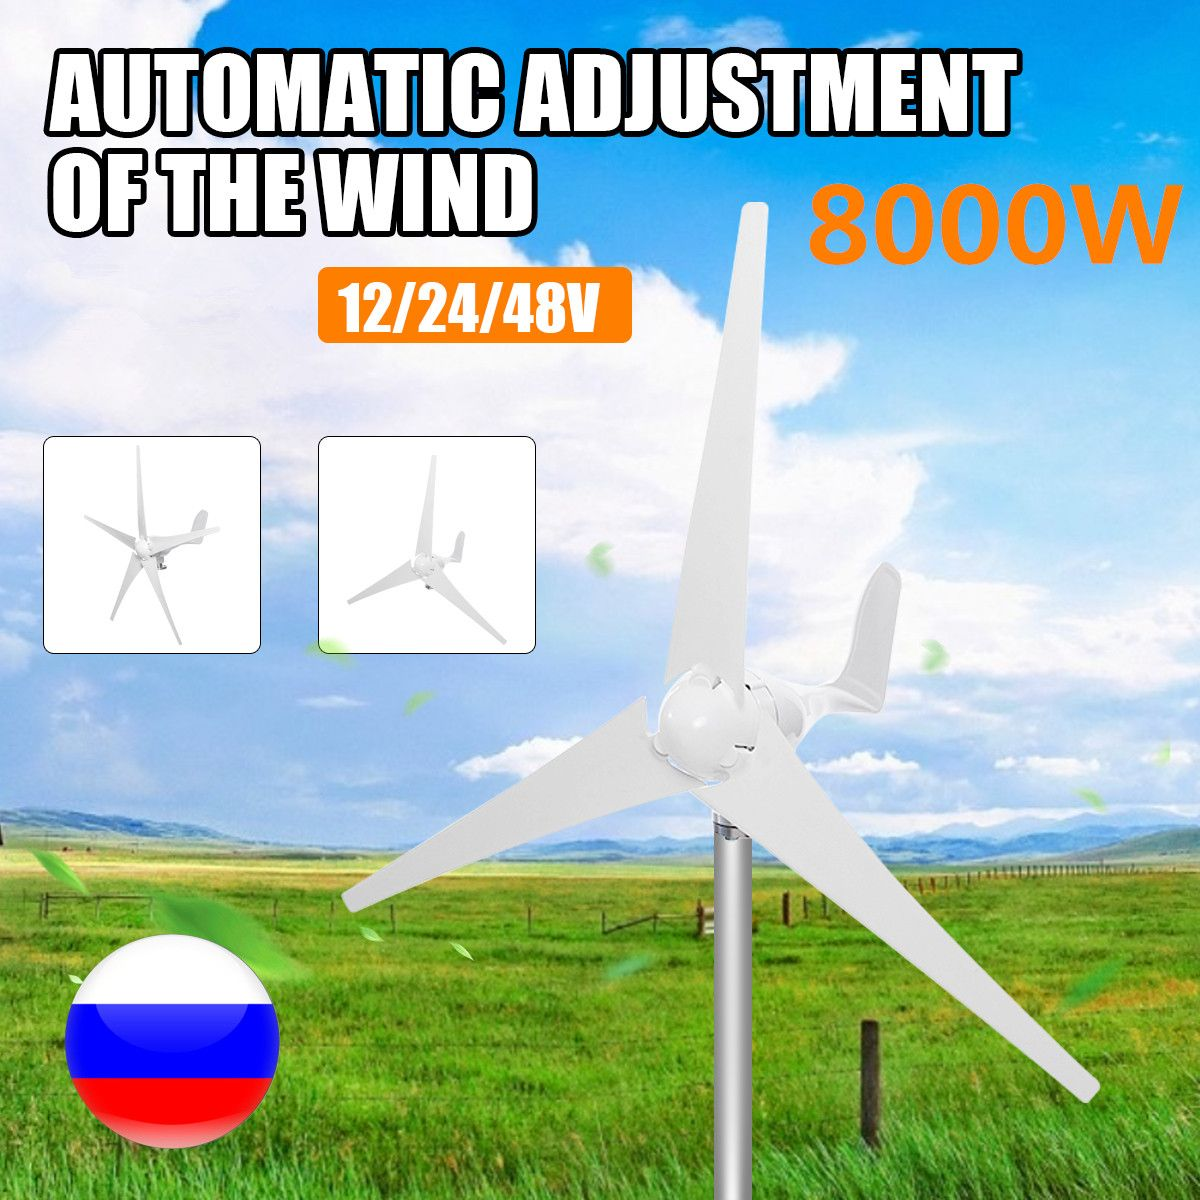 Generador de turbinas eólicas de 8000W, opción de aerosoles de 12/24/48V 3/5 con controlador de carga impermeable apto para el hogar o Camping